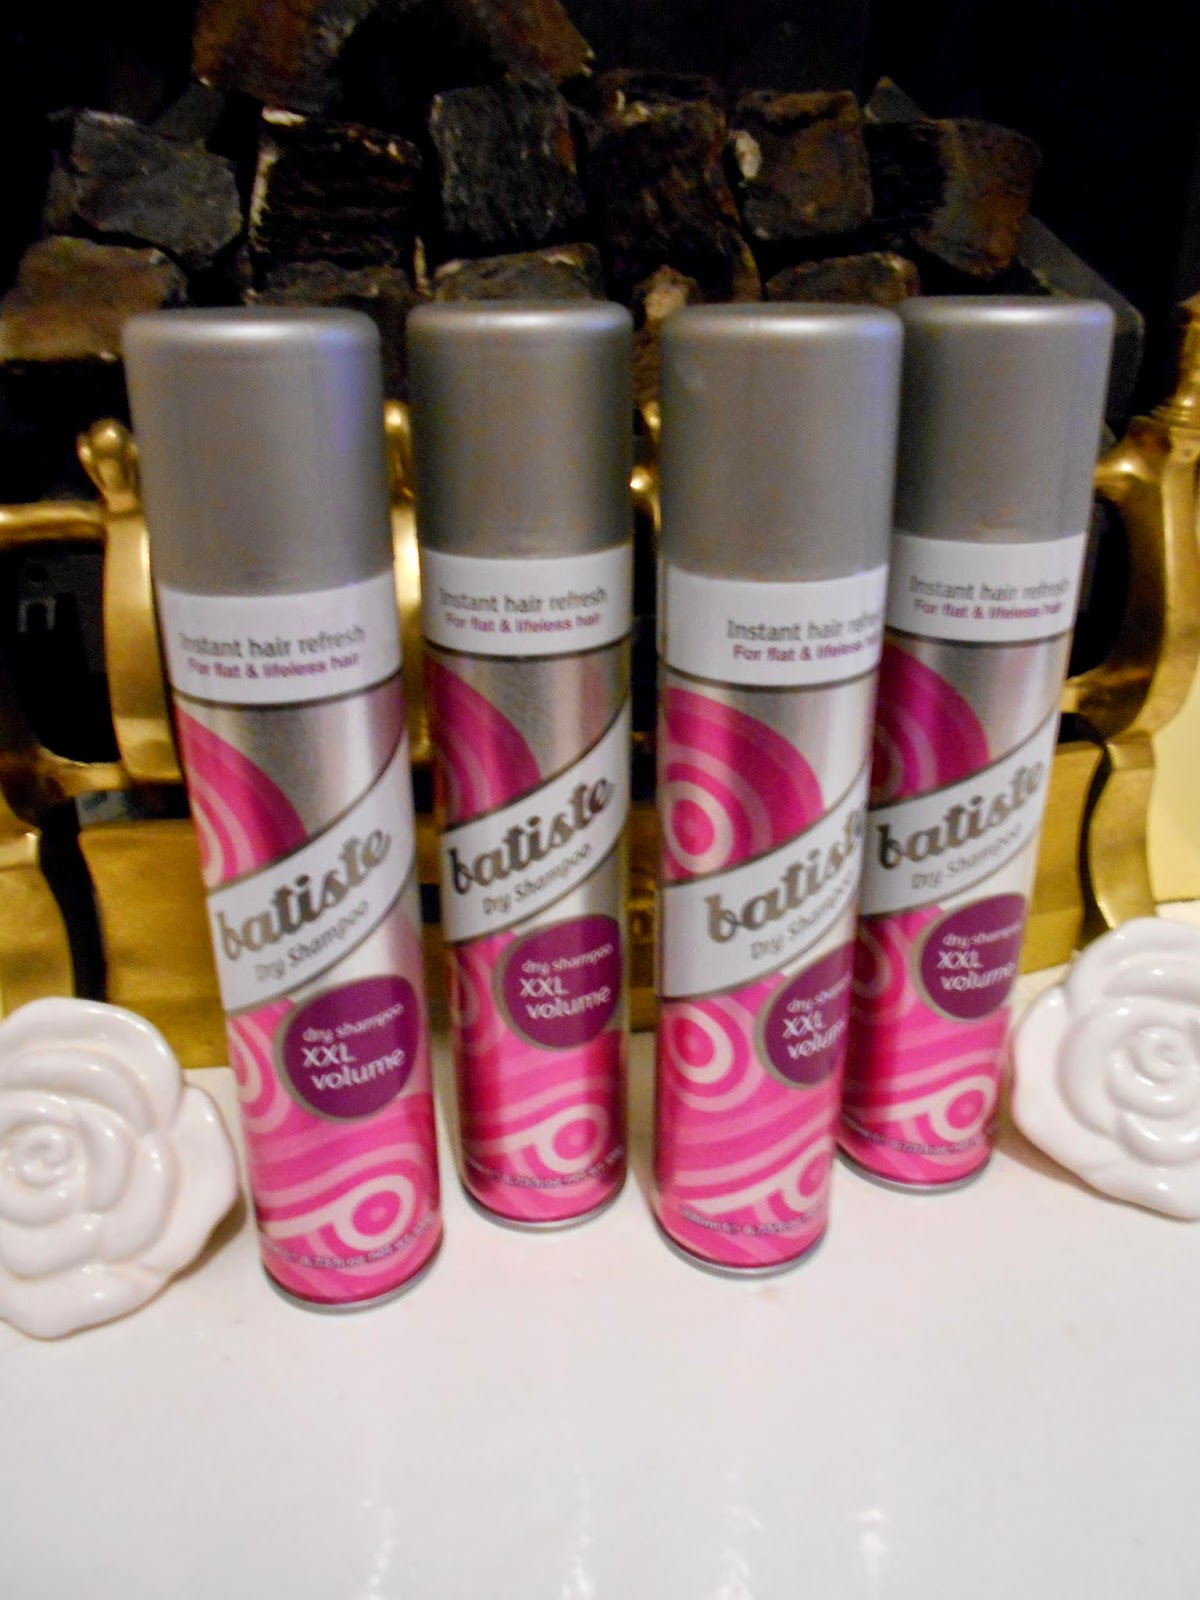 Batiste XXL Volume - Dry Shampoo